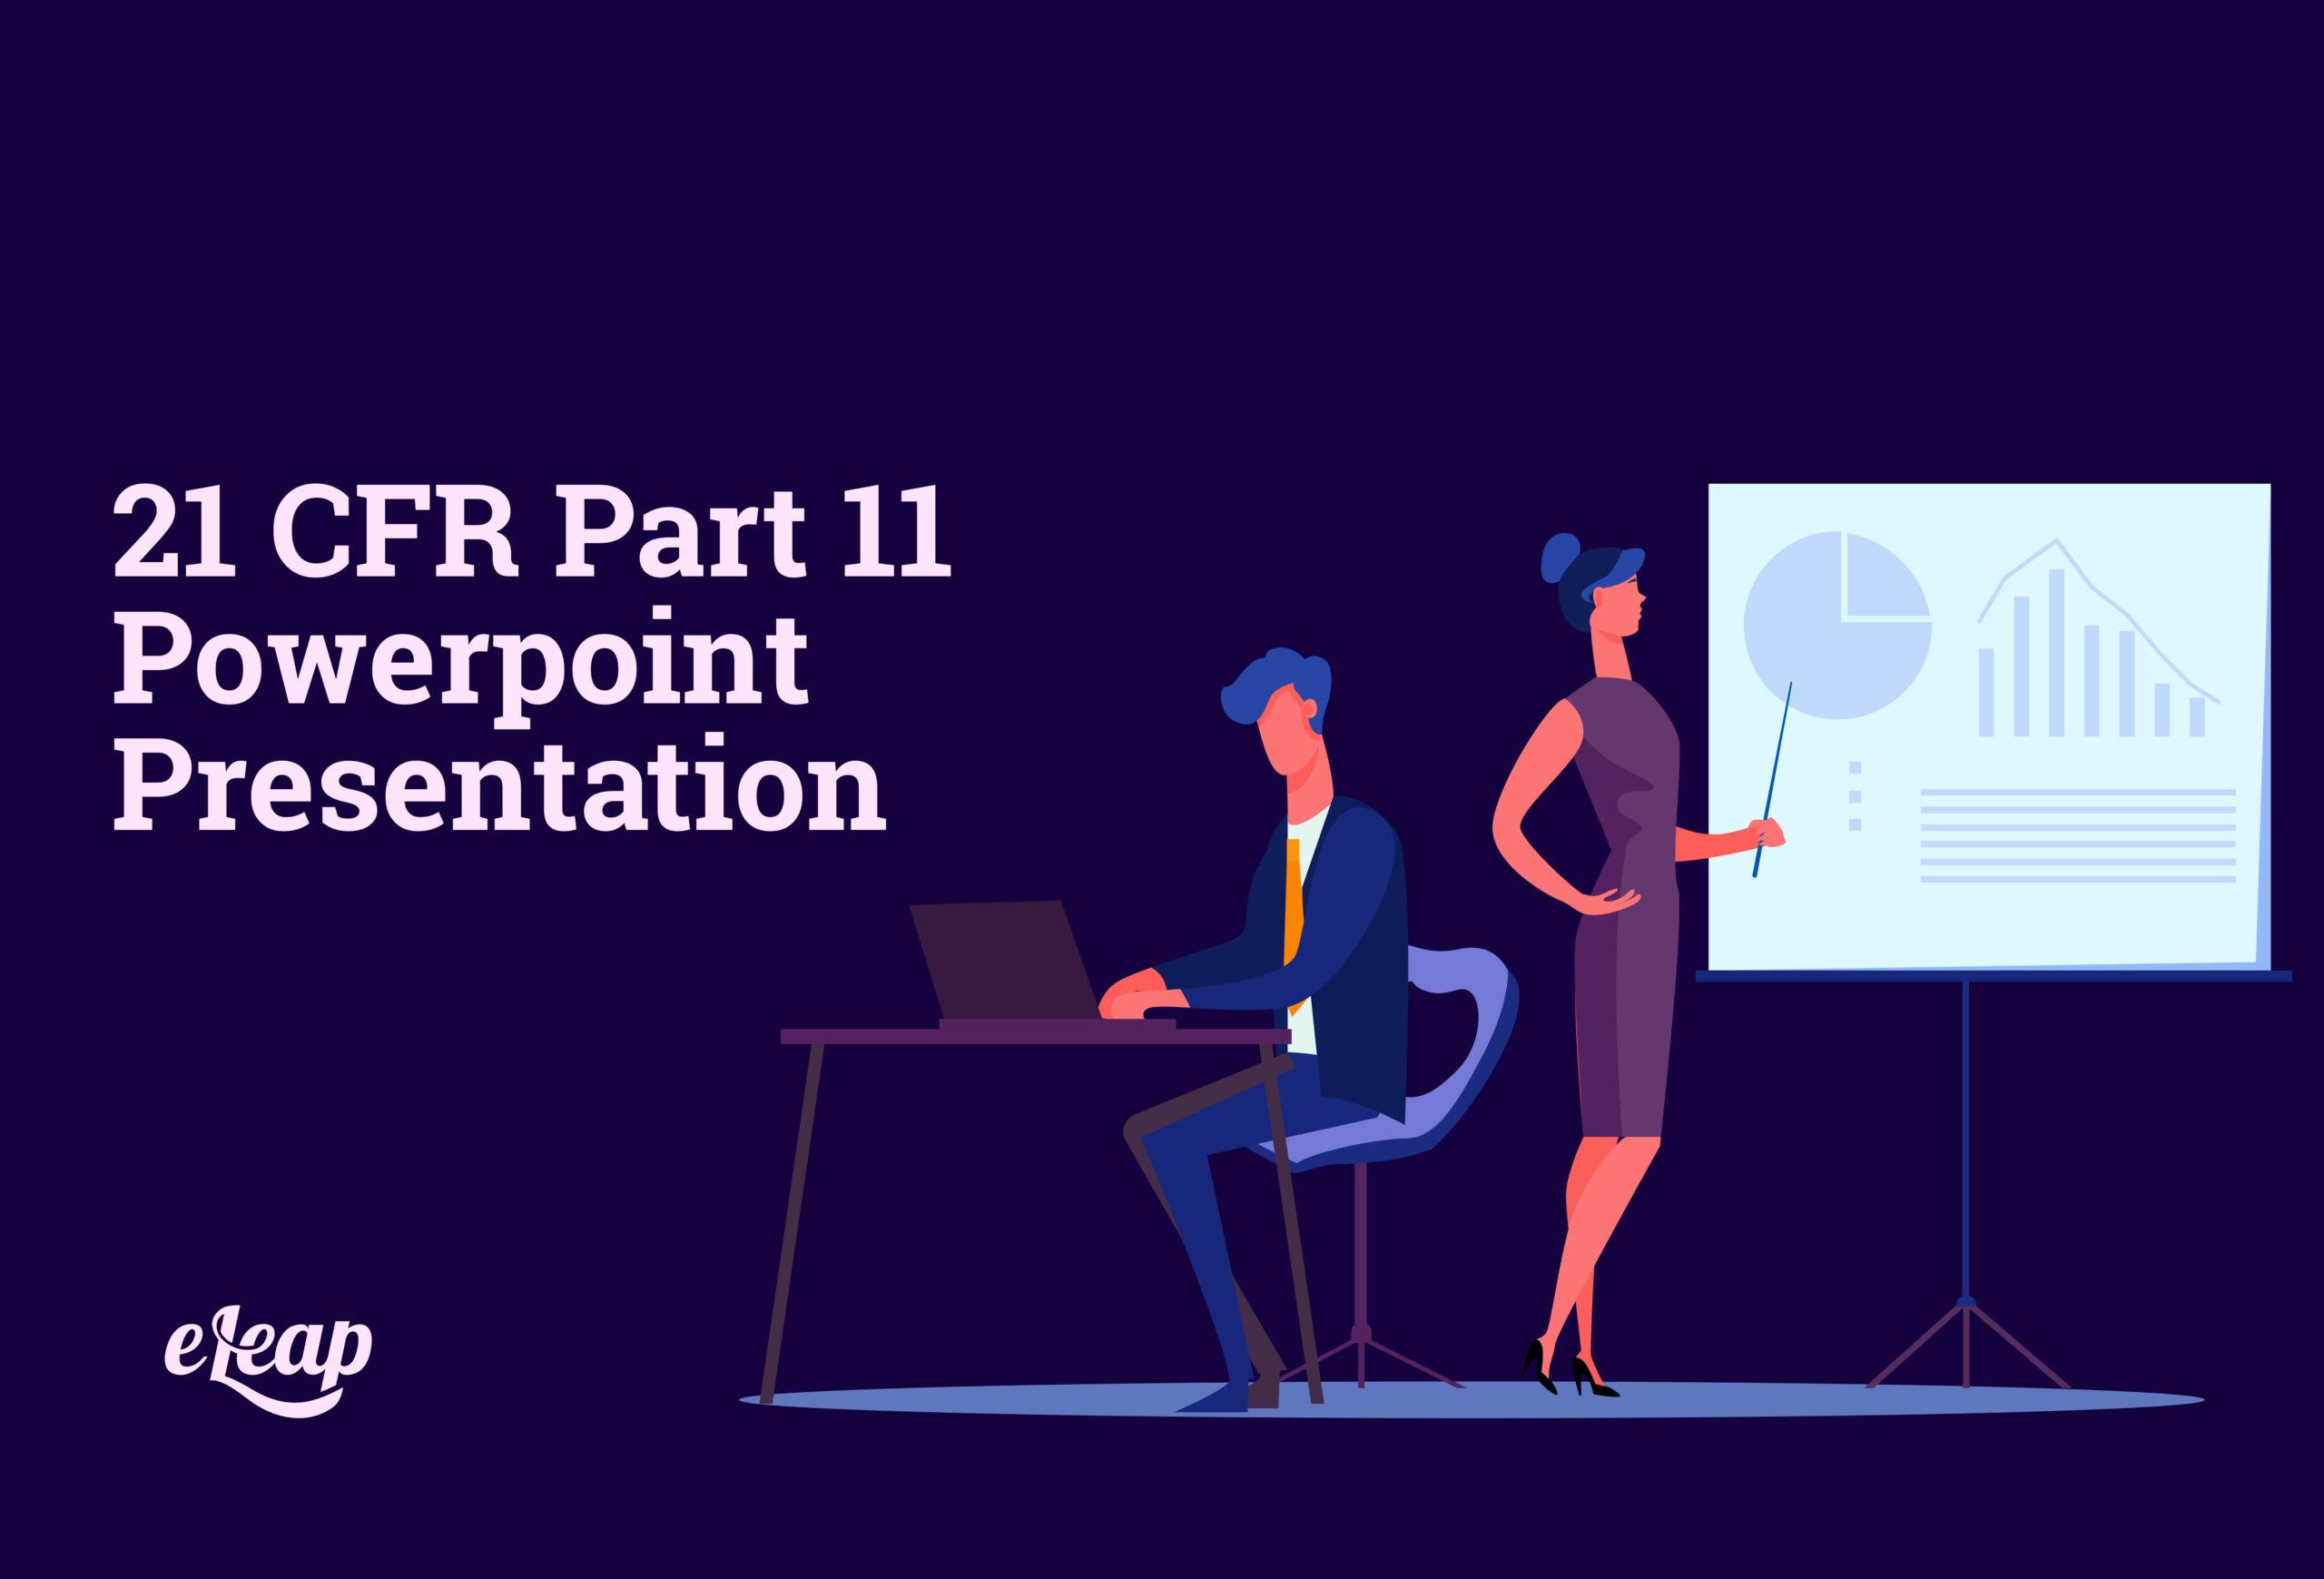 21 CFR Part 11 Powerpoint Presentation